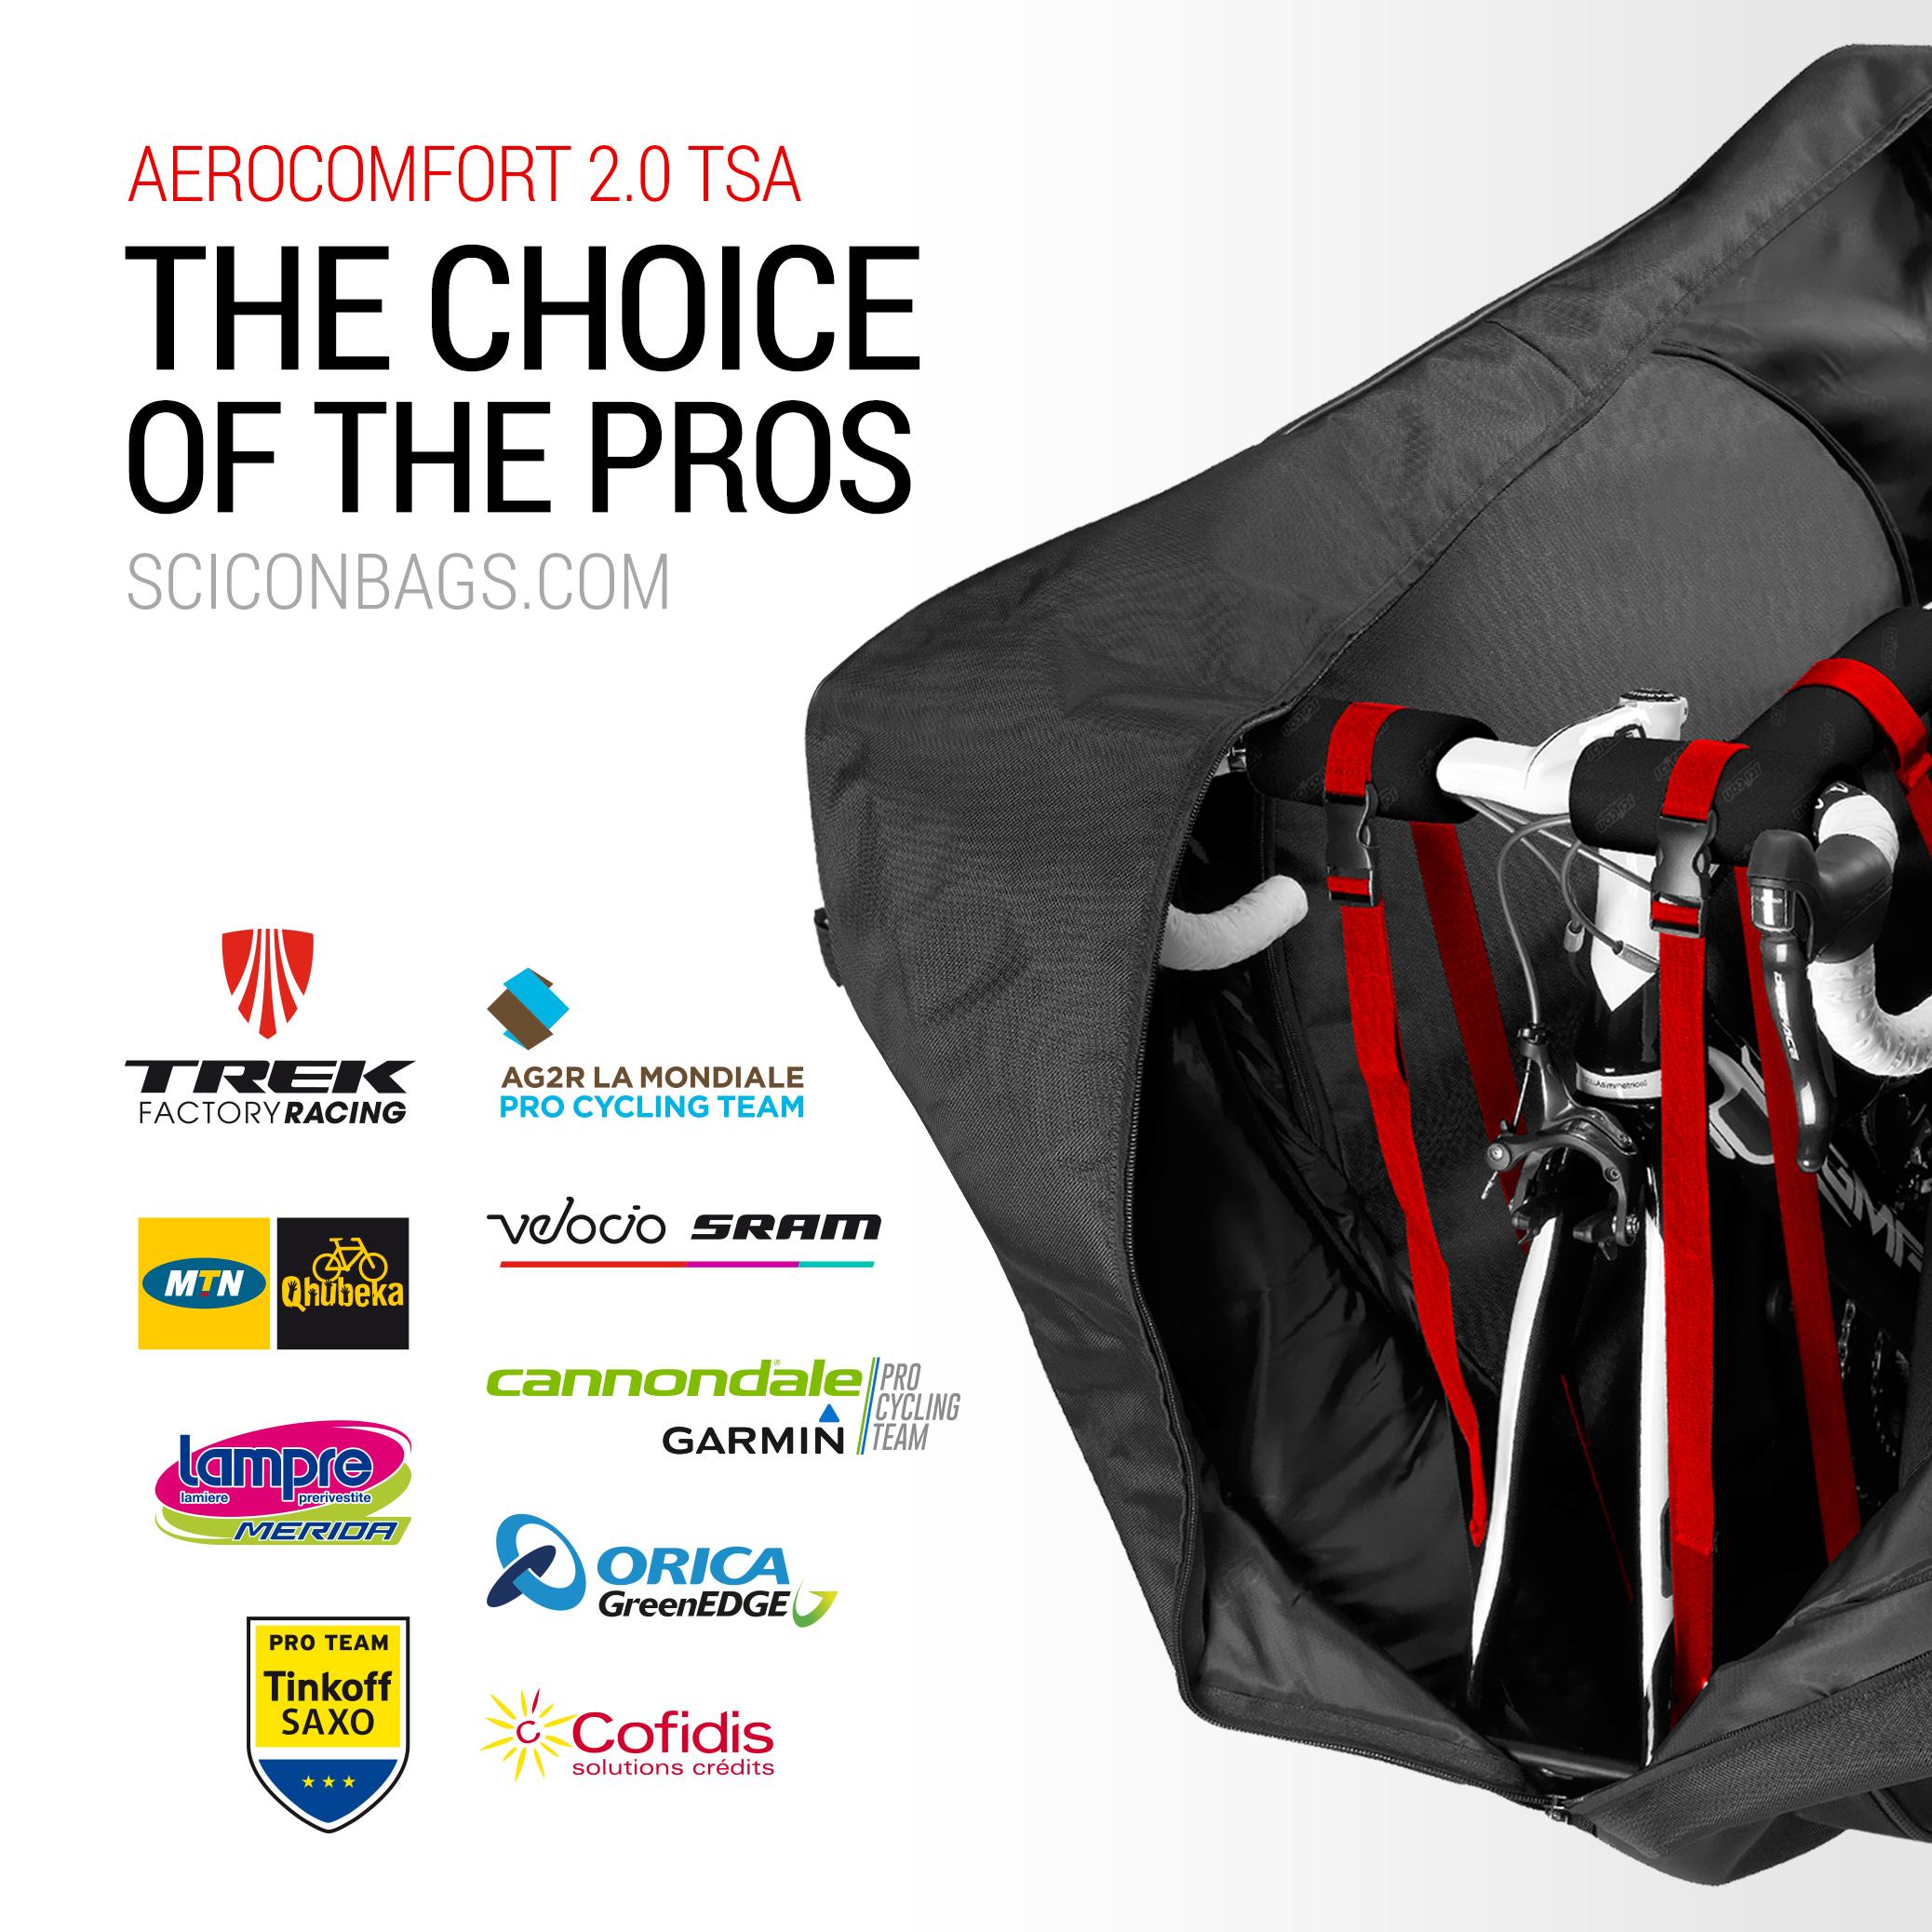 Scicon Aerocomfort 2 0 Tsa Bike Travel Bag 시콘 에어로컴포트 2 0